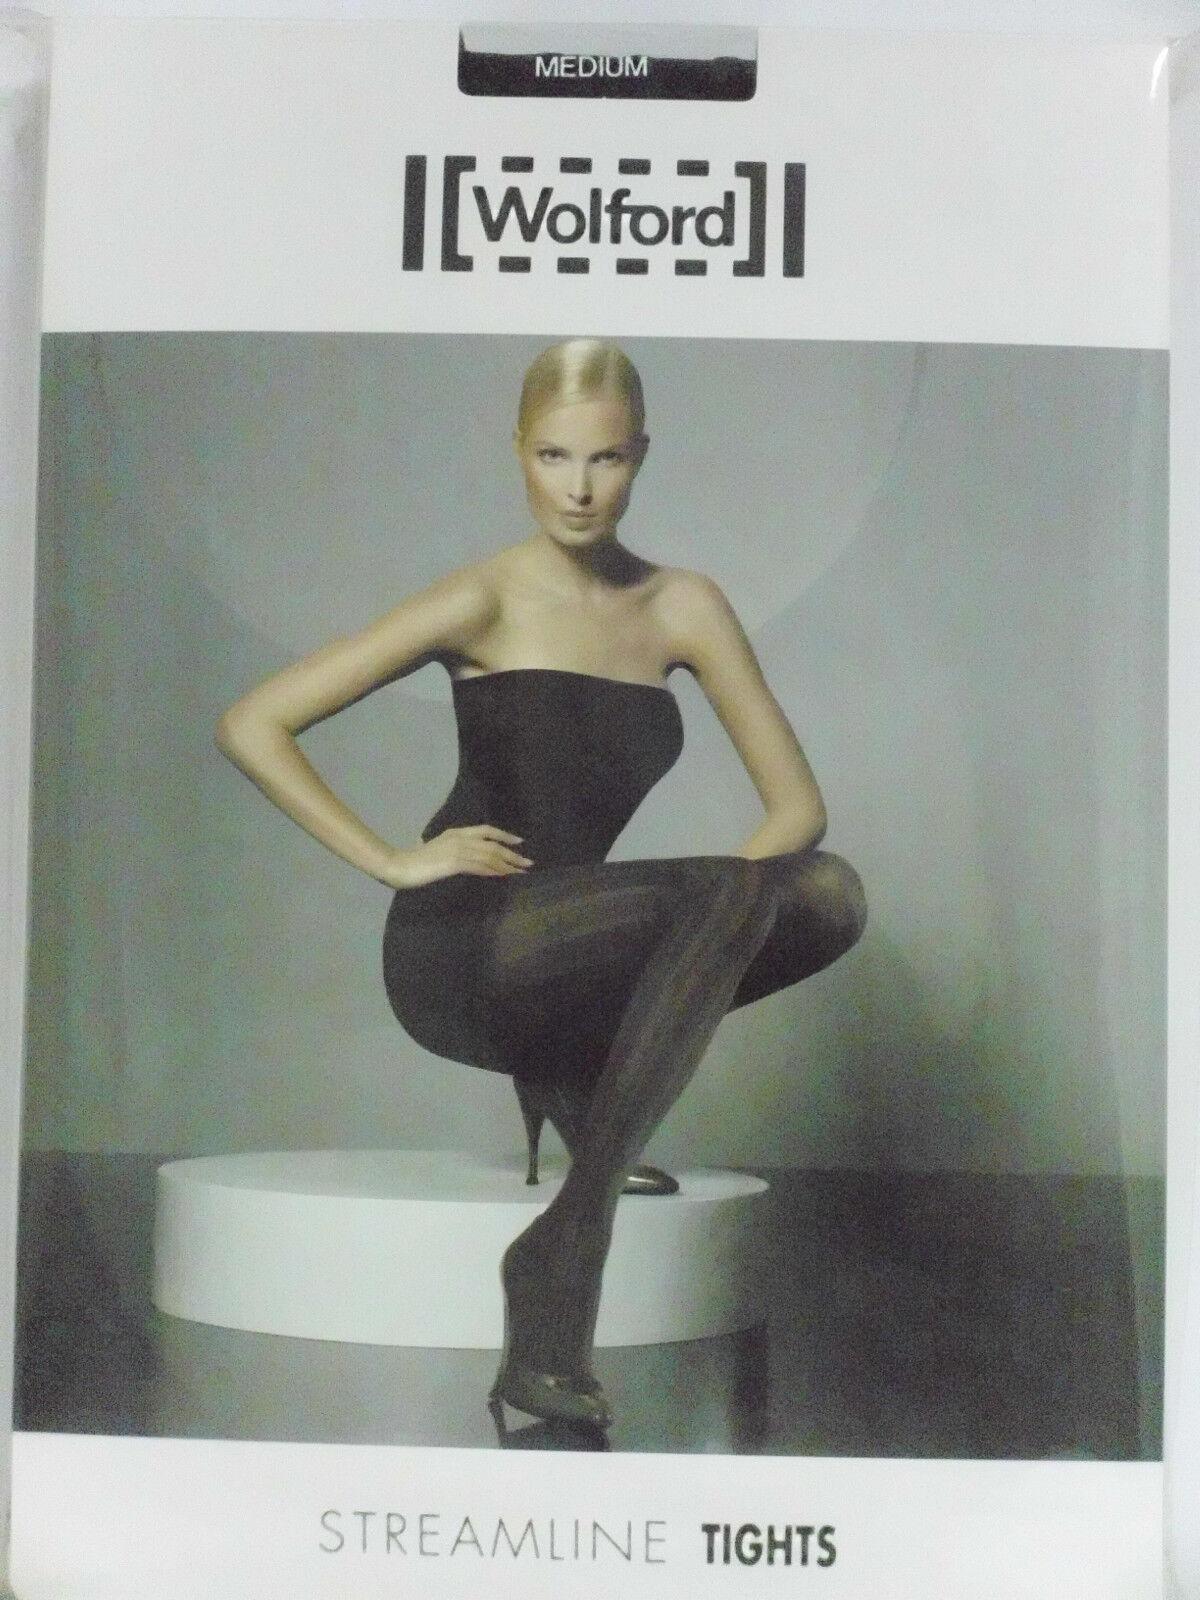 Wolford Streamline Strumpfhose mocca    Gr. L   | Sehr gute Farbe  | Berühmter Laden  | Das hochwertigste Material  a191e2